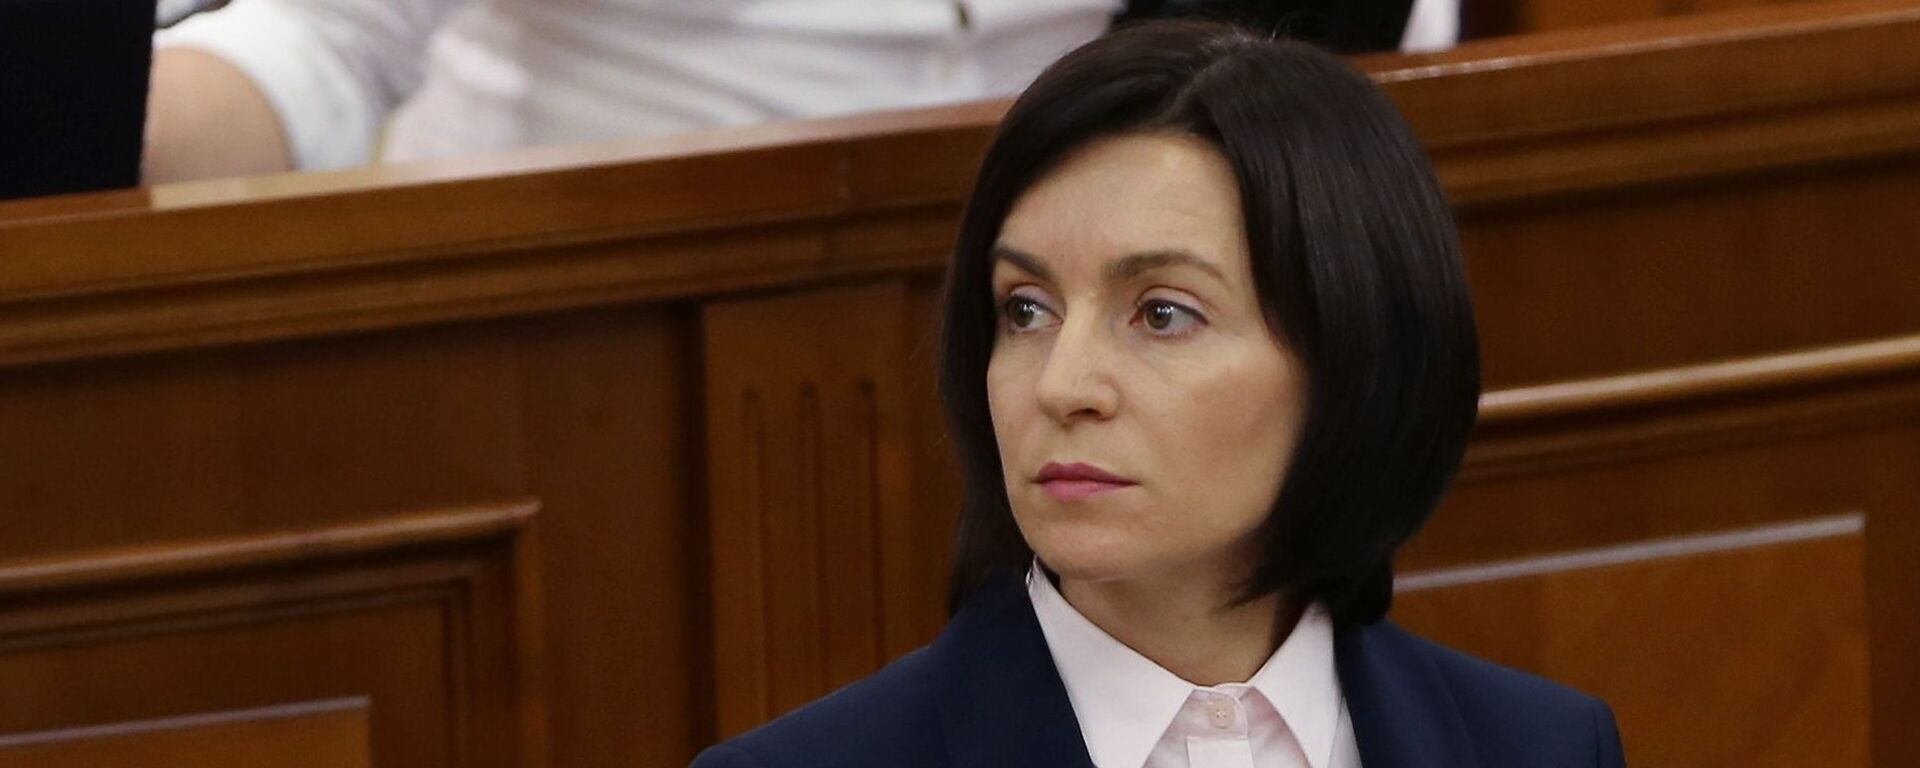 Maia Sandu, presidenta electa de Moldavia - Sputnik Mundo, 1920, 28.04.2021